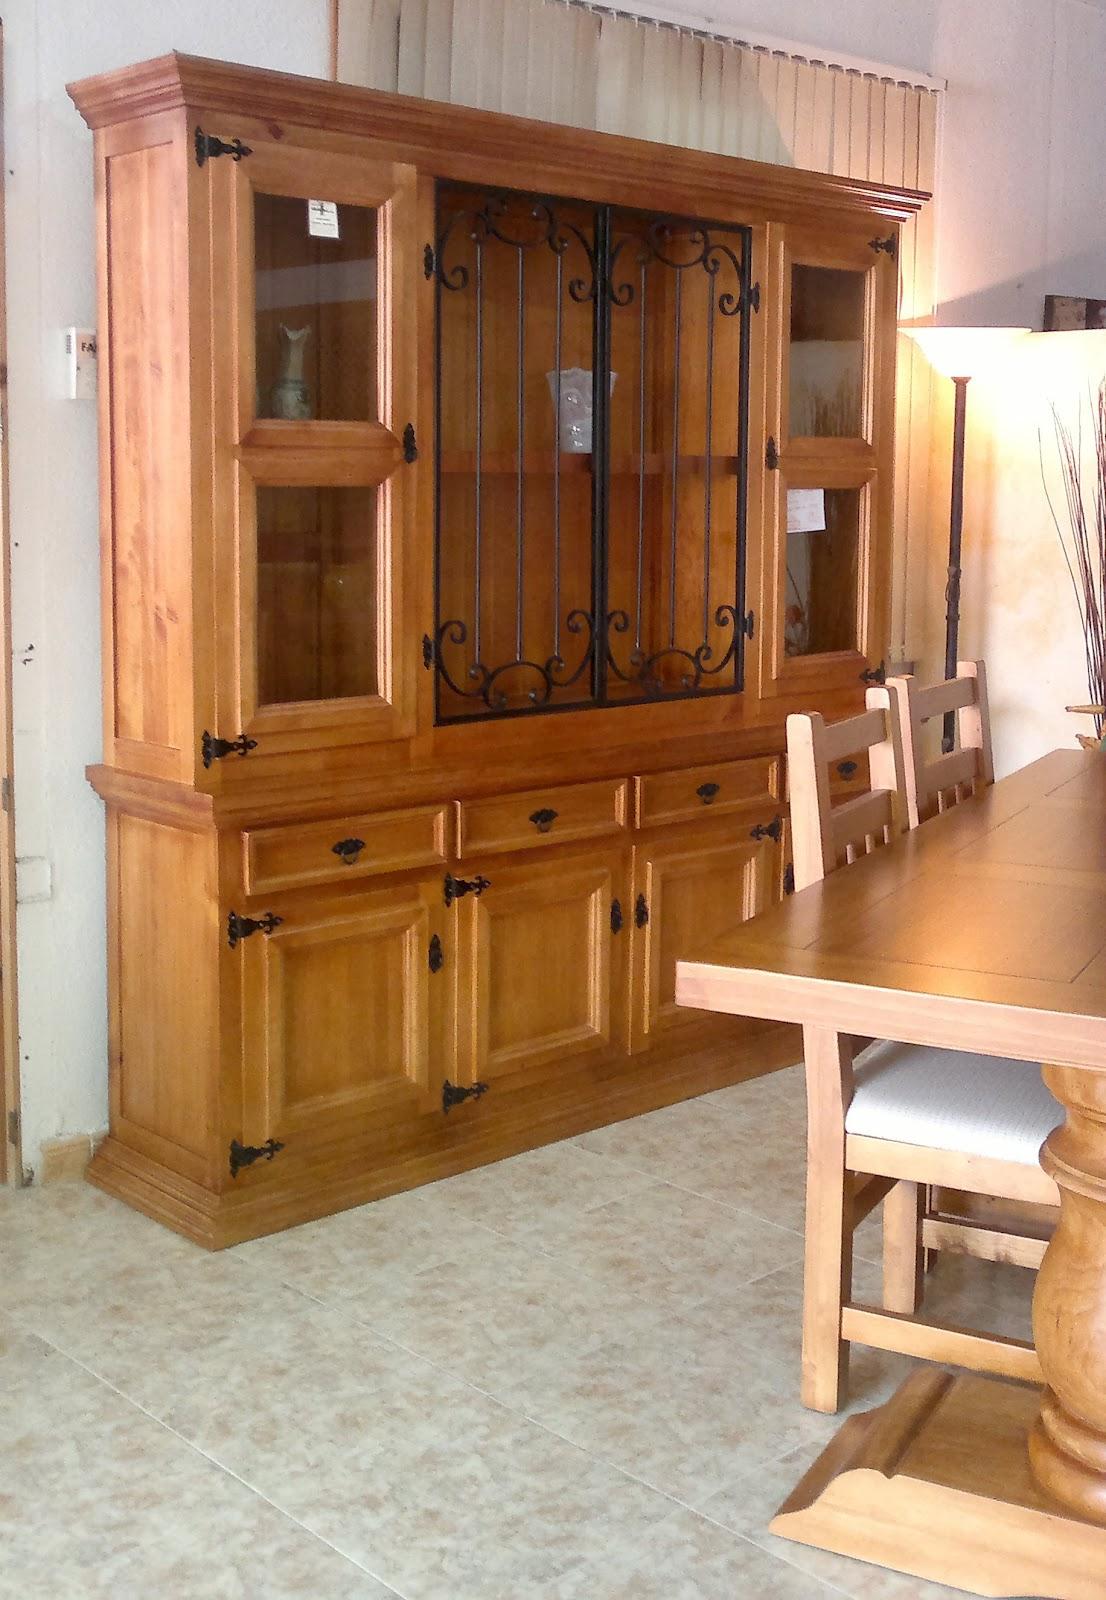 Provenzal muebles muebles para banos pequenos modernos for Muebles pino baratos